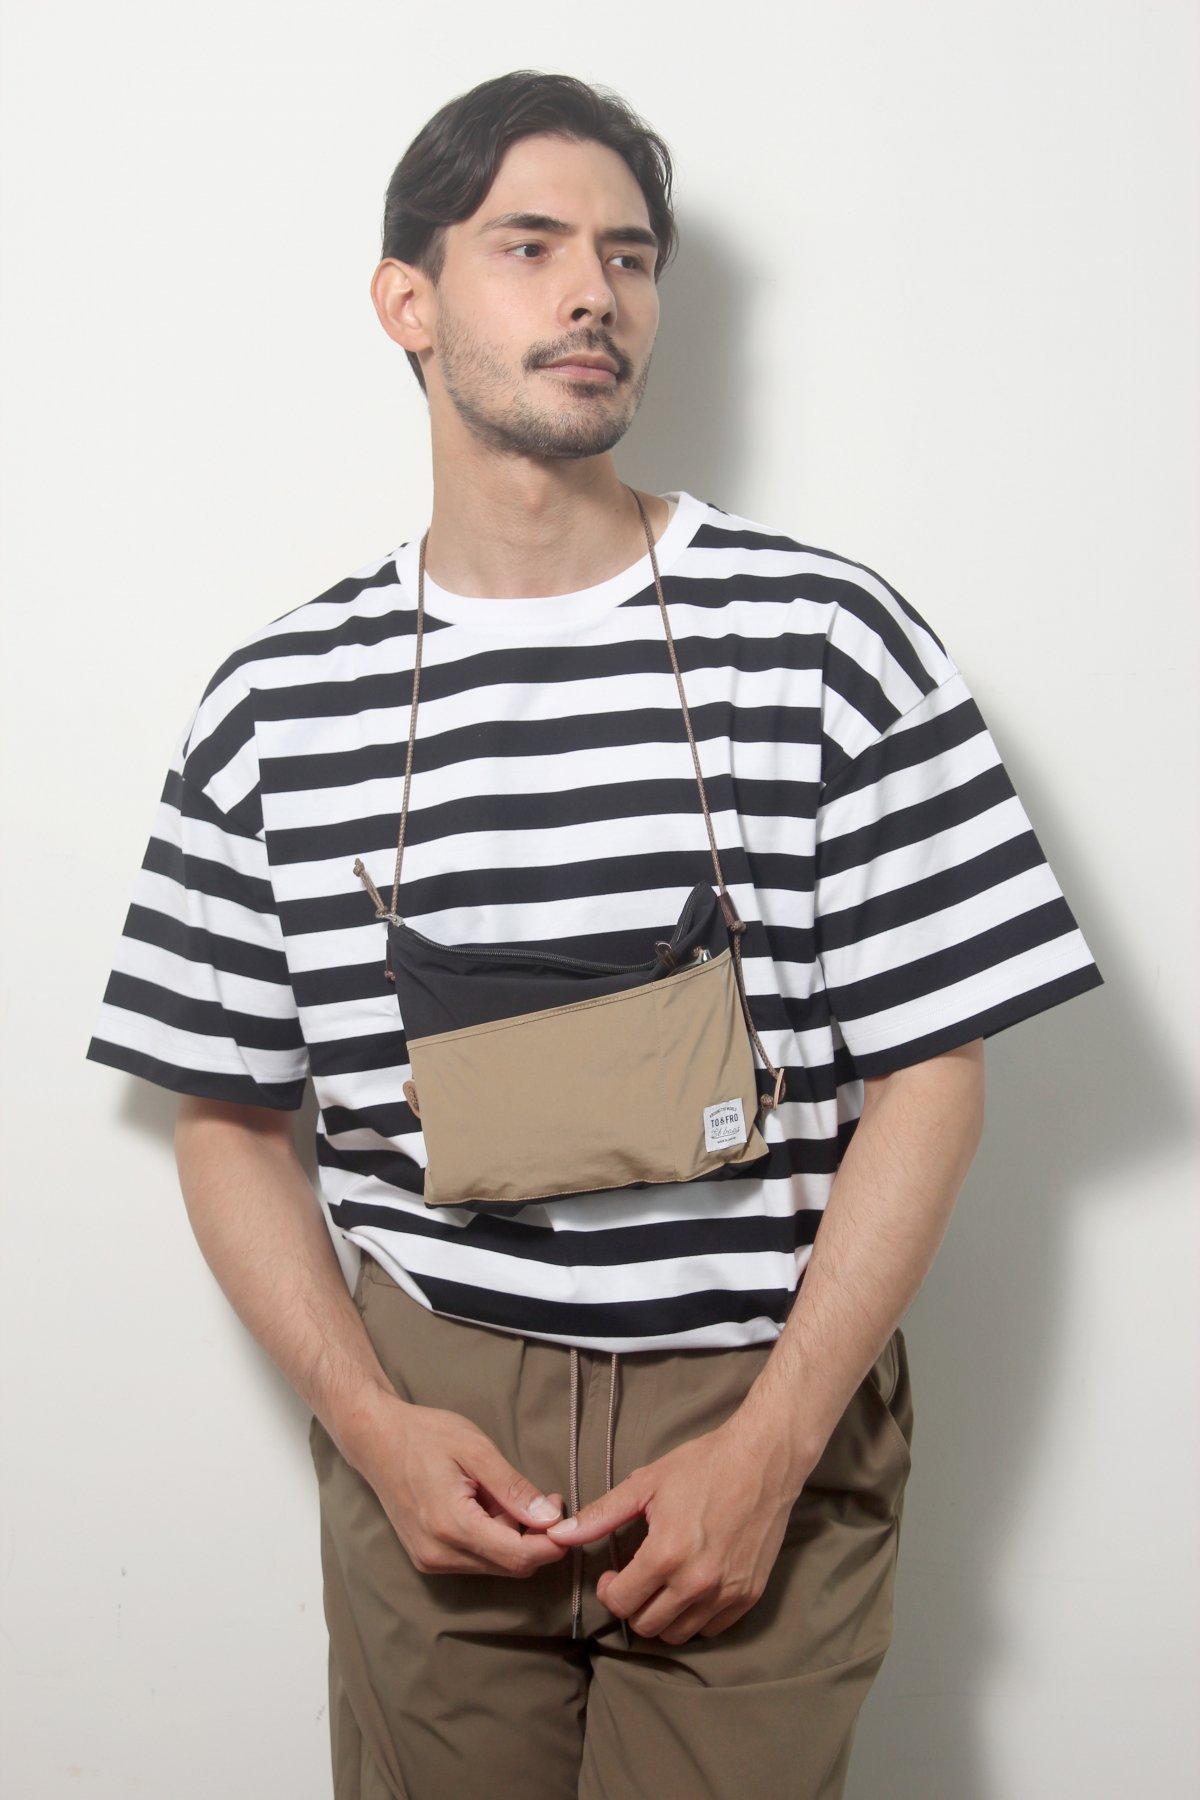 SACOCHE bag(Et baas x TO&FRO) 詳細画像12